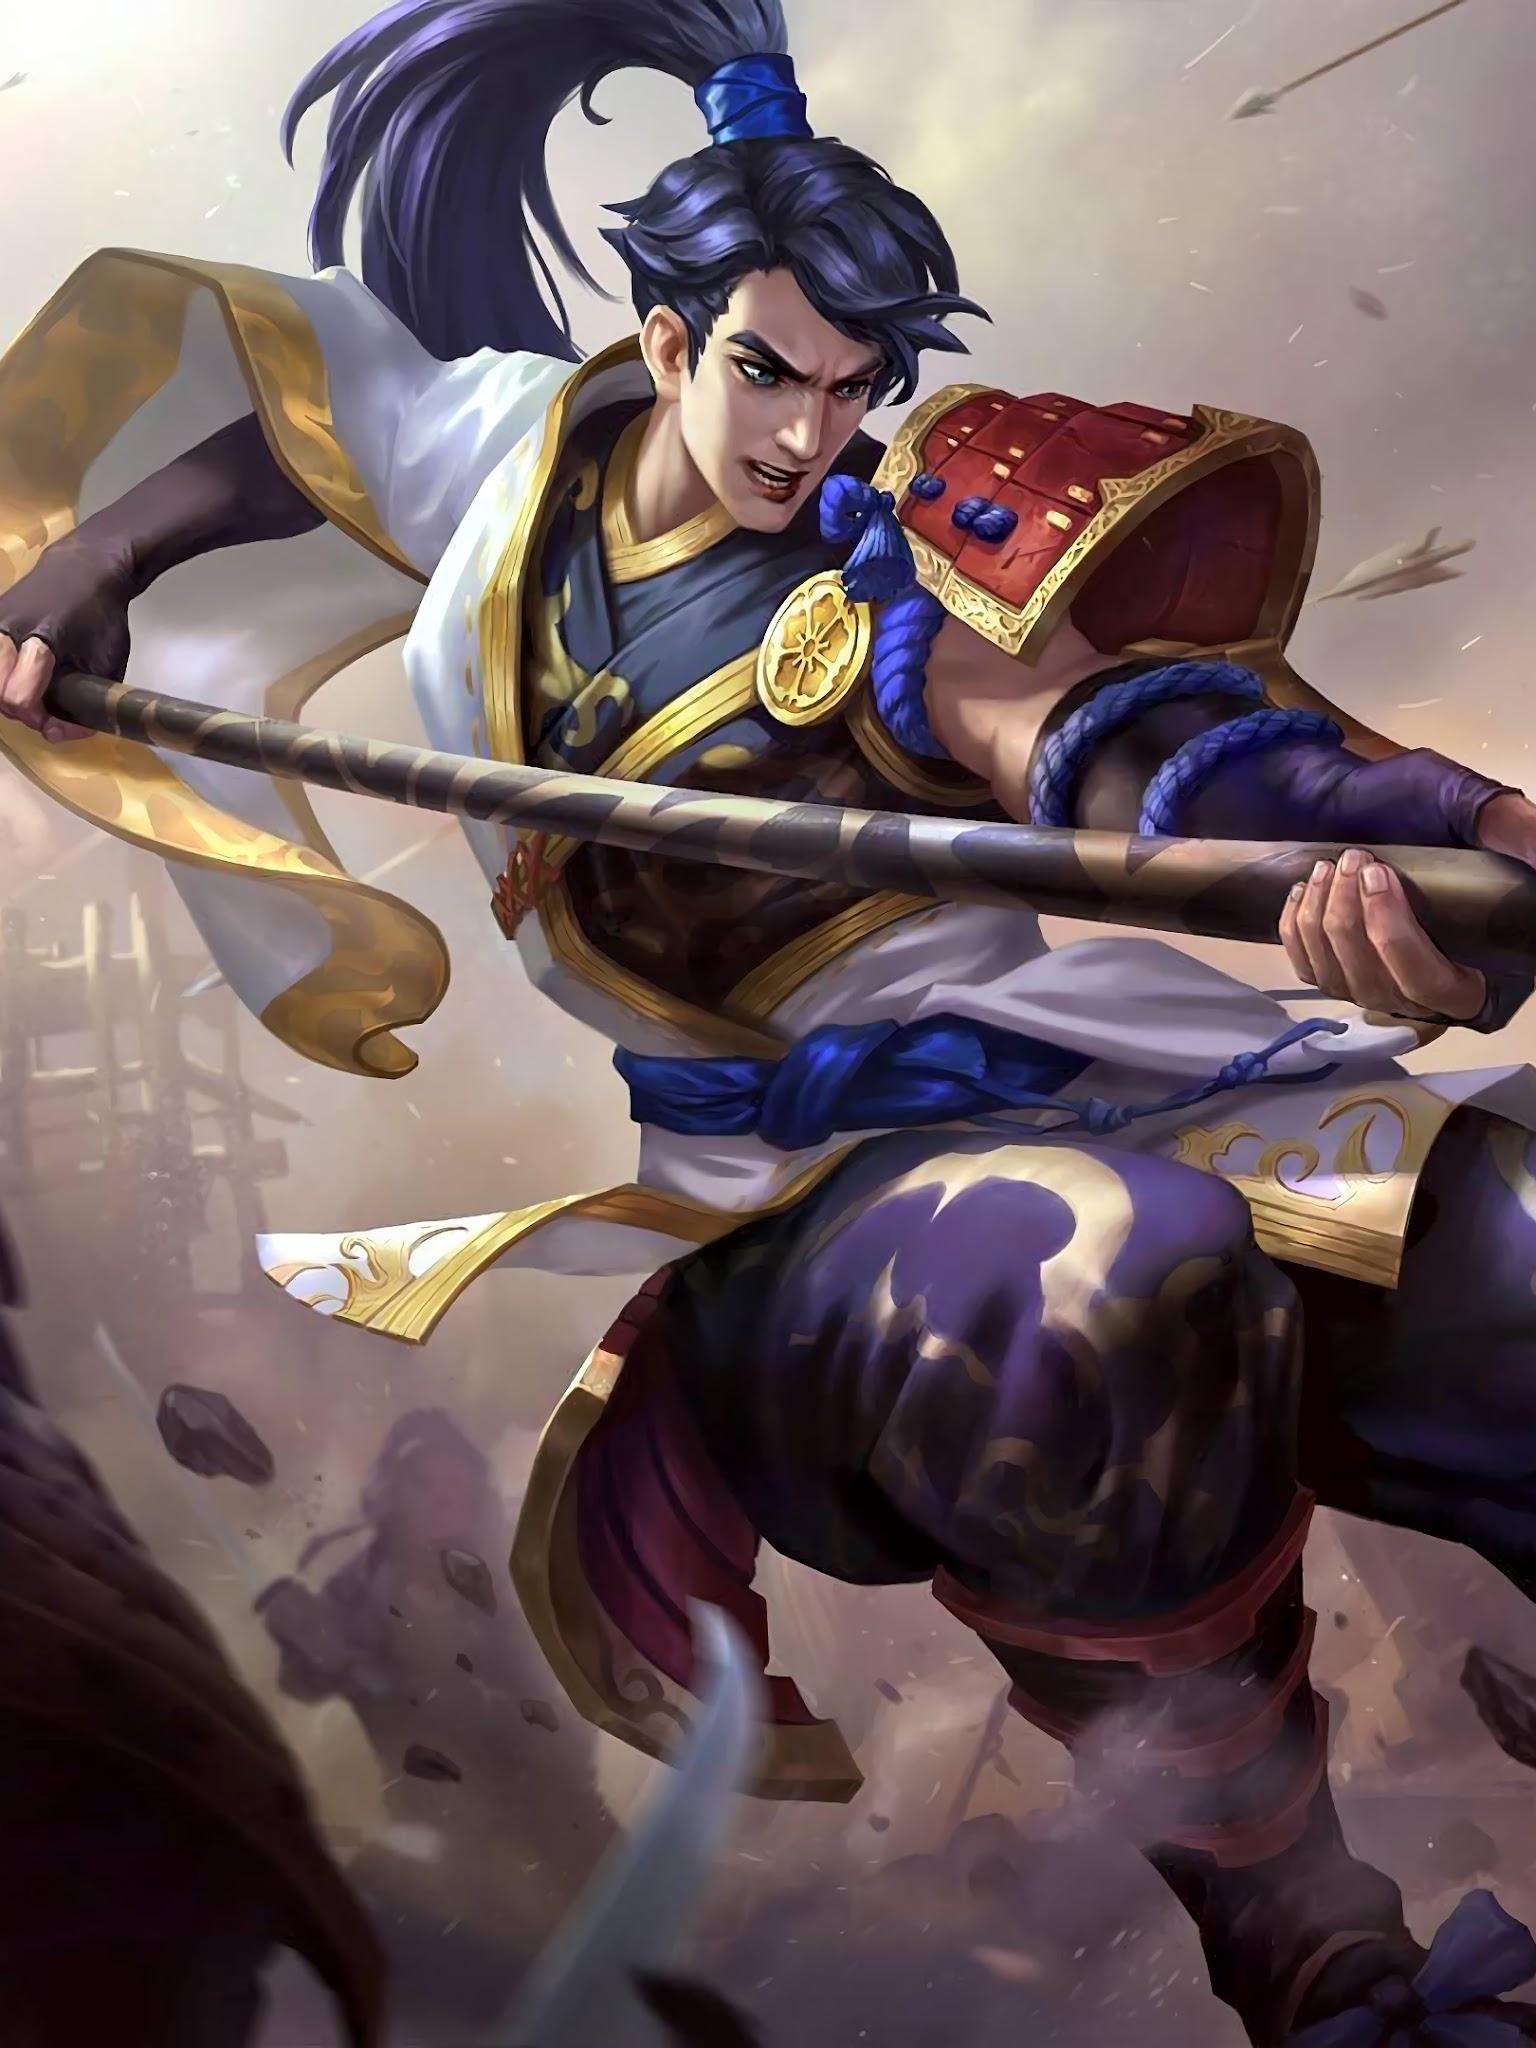 Zilong Eastern Warrior Skin Mobile Legends 4K Wallpaper 165